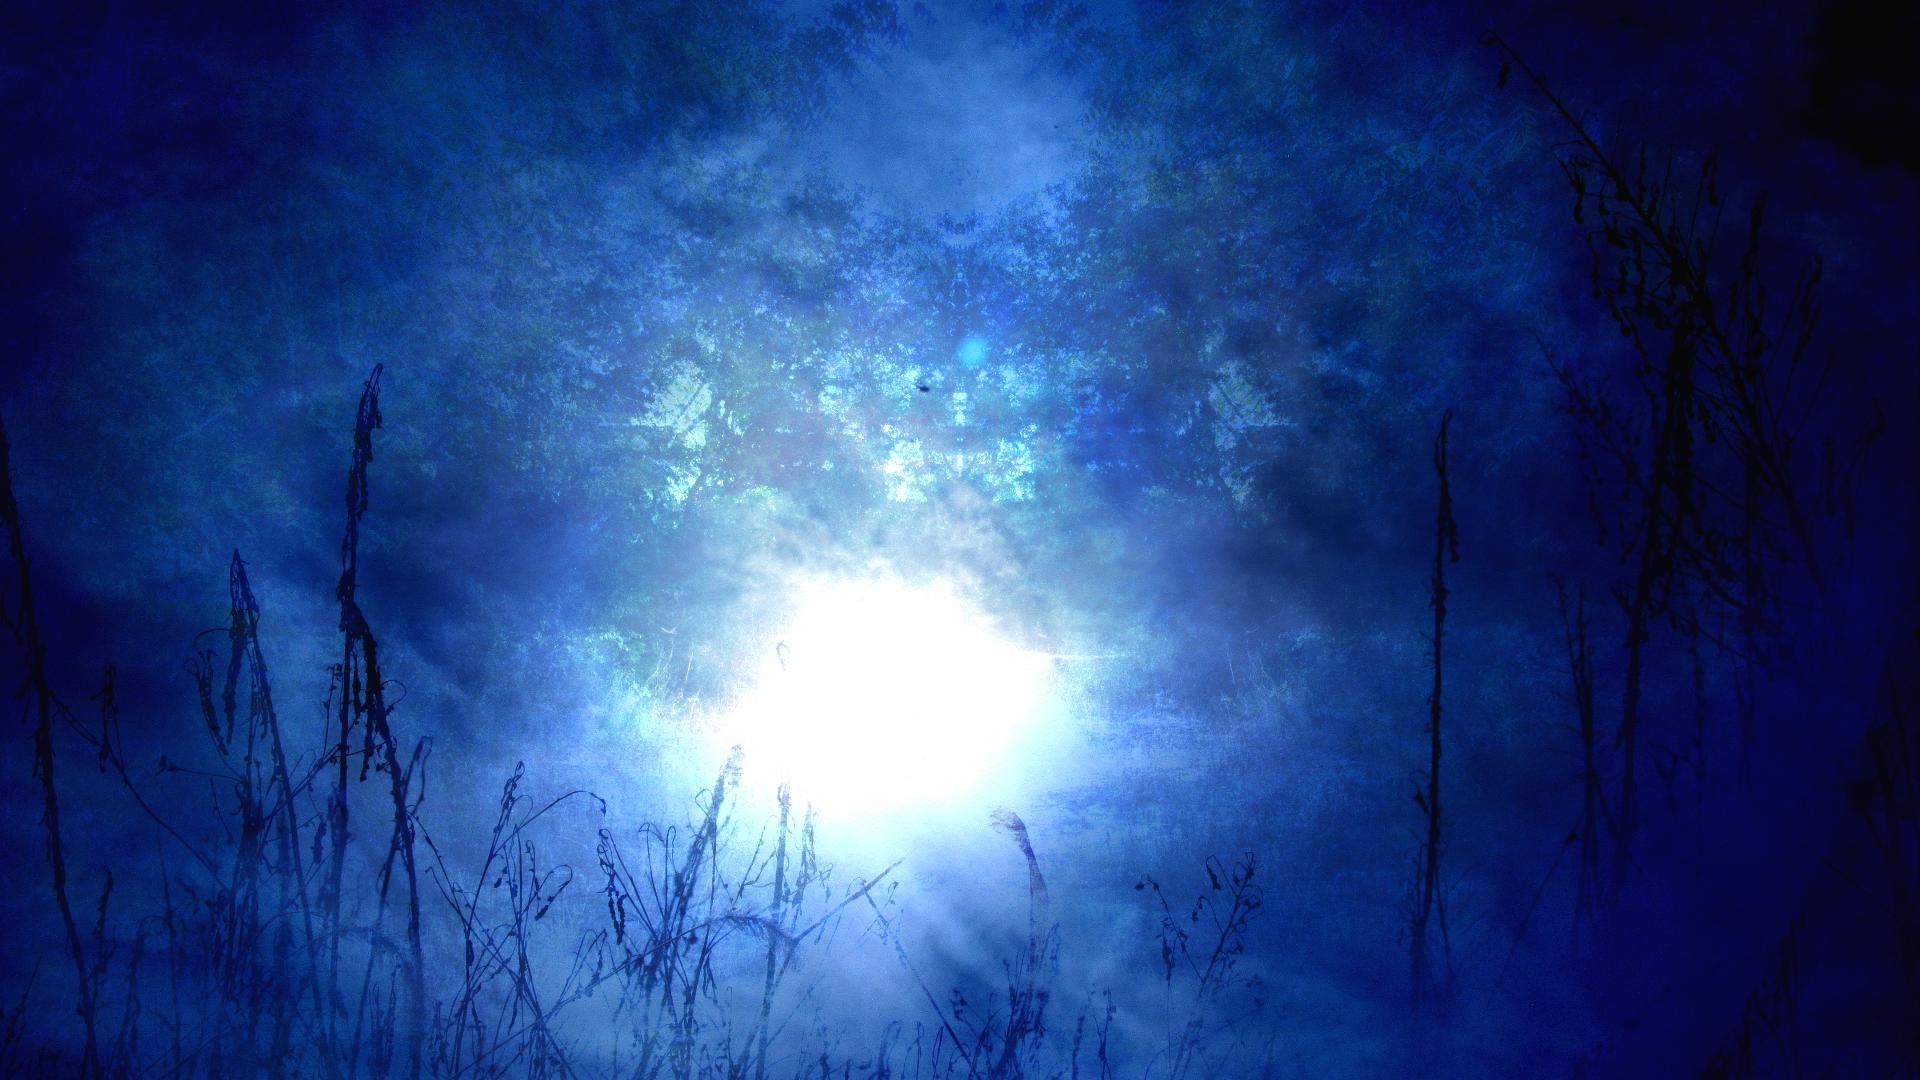 Spiritual Glow Wallpaper by CornyCreations on DeviantArt